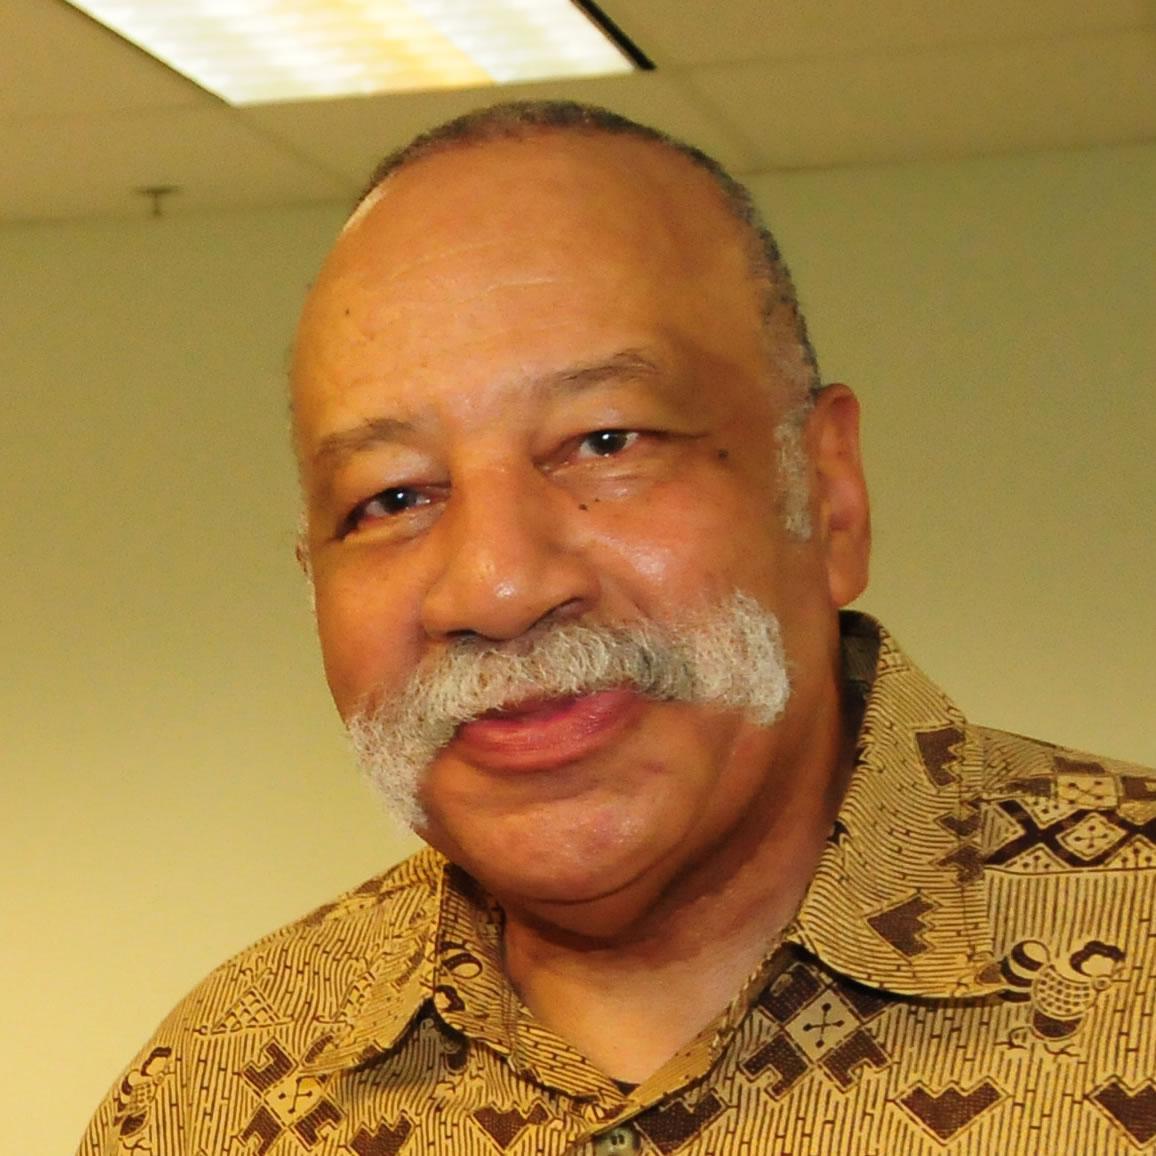 Philip G. Sadler Jr